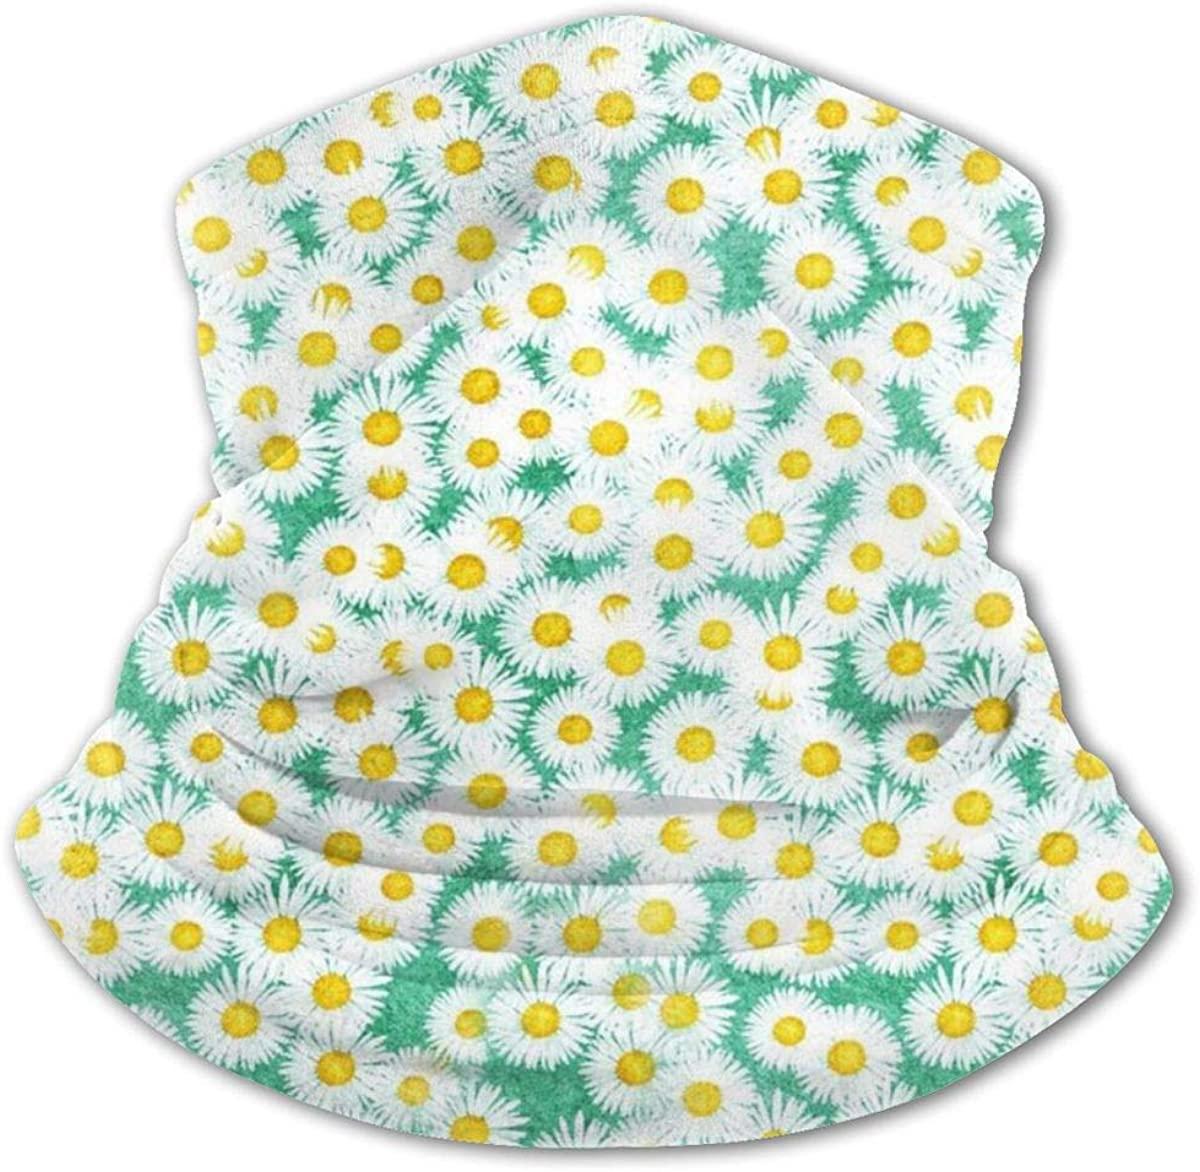 Bellis Perennis Field Headwear For Girls And Boys, Head Wrap, Neck Gaiter, Headband, Tenn Fishing Mask, Magic Scarf, Tube Mask, Face Bandana Mask For Camping Running Cycling